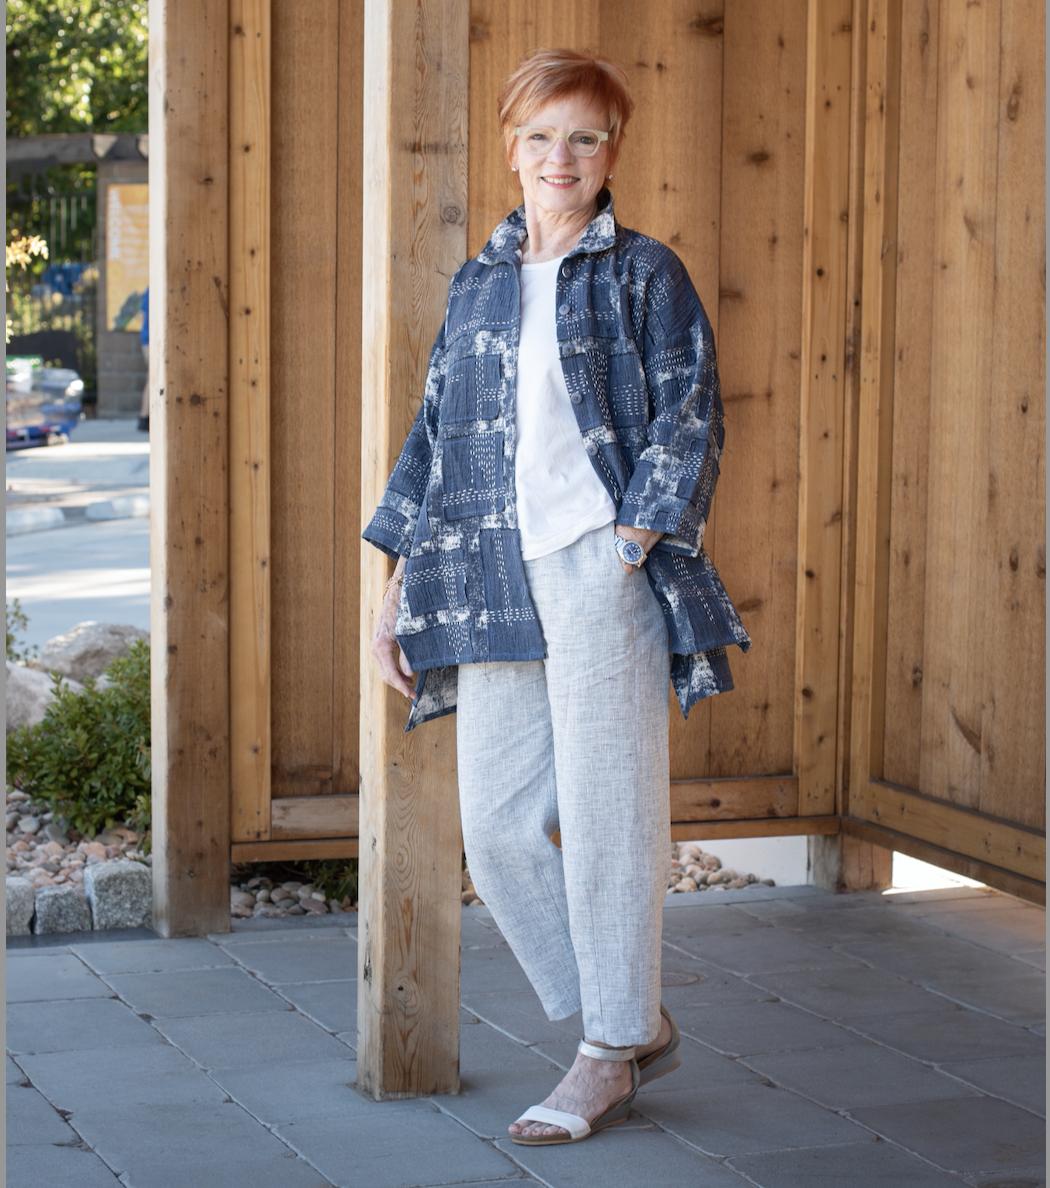 Boro-Inspired London Jacket Sew Confident! Online Workshop